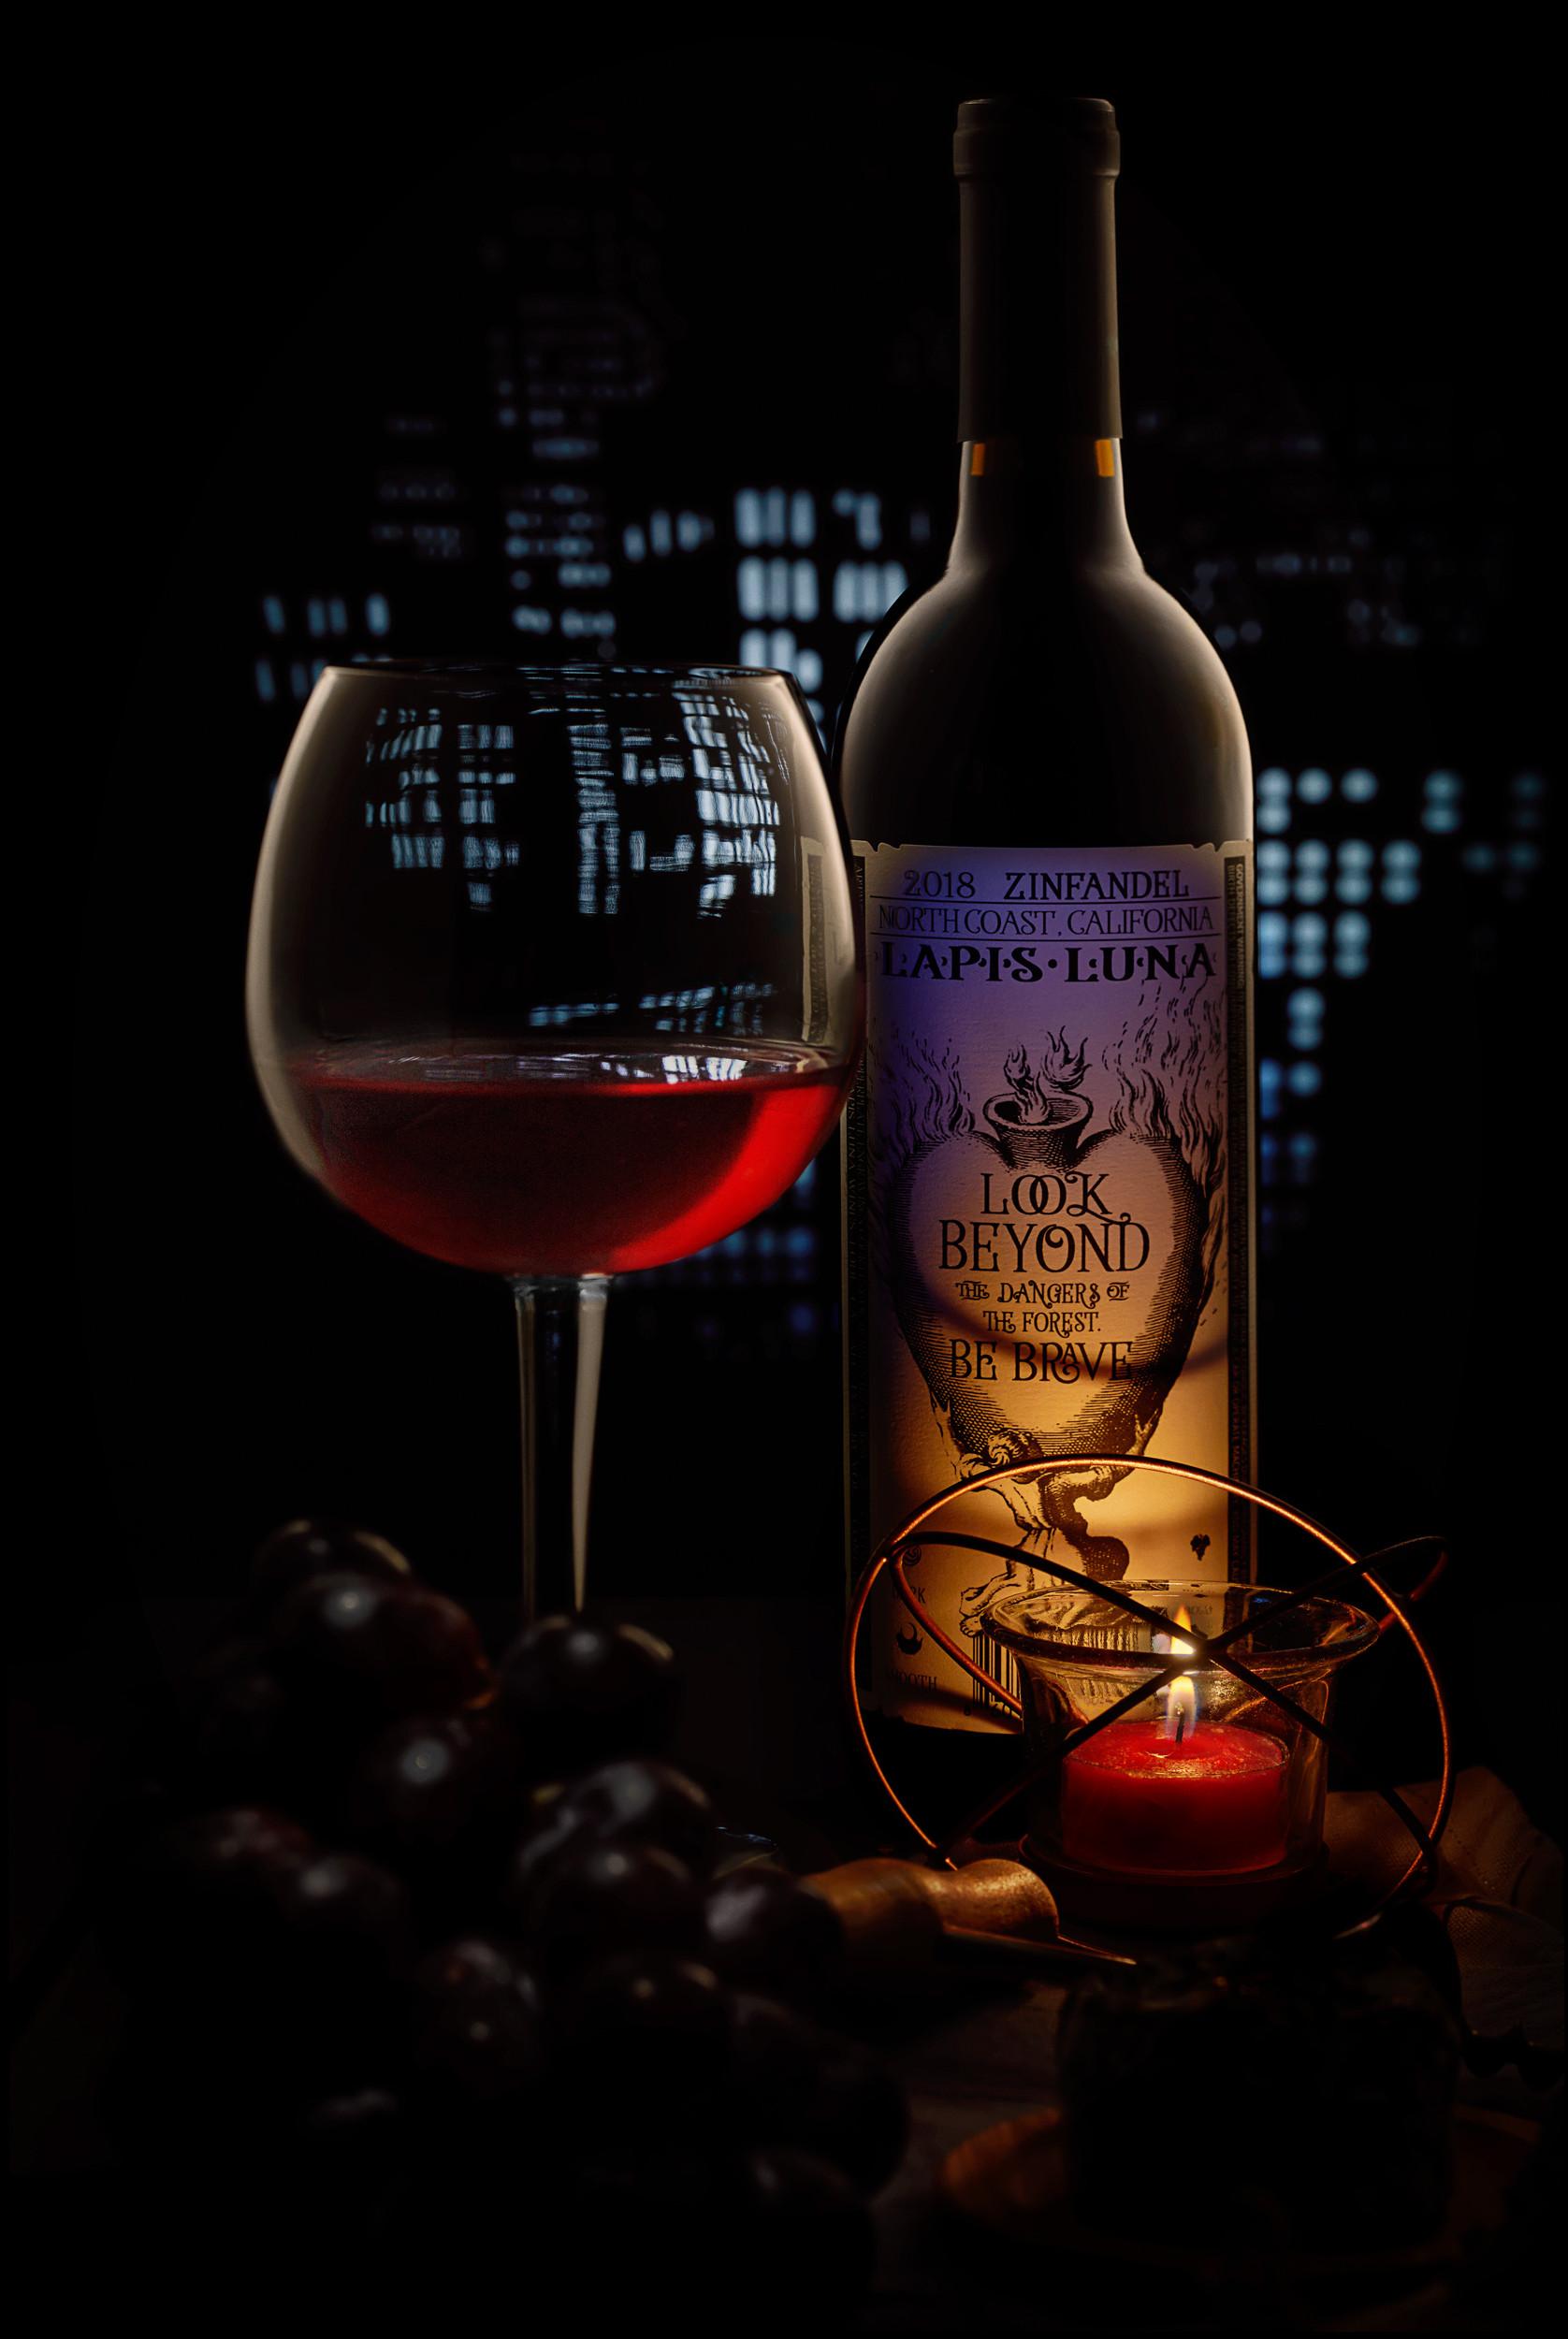 Wine at night city.